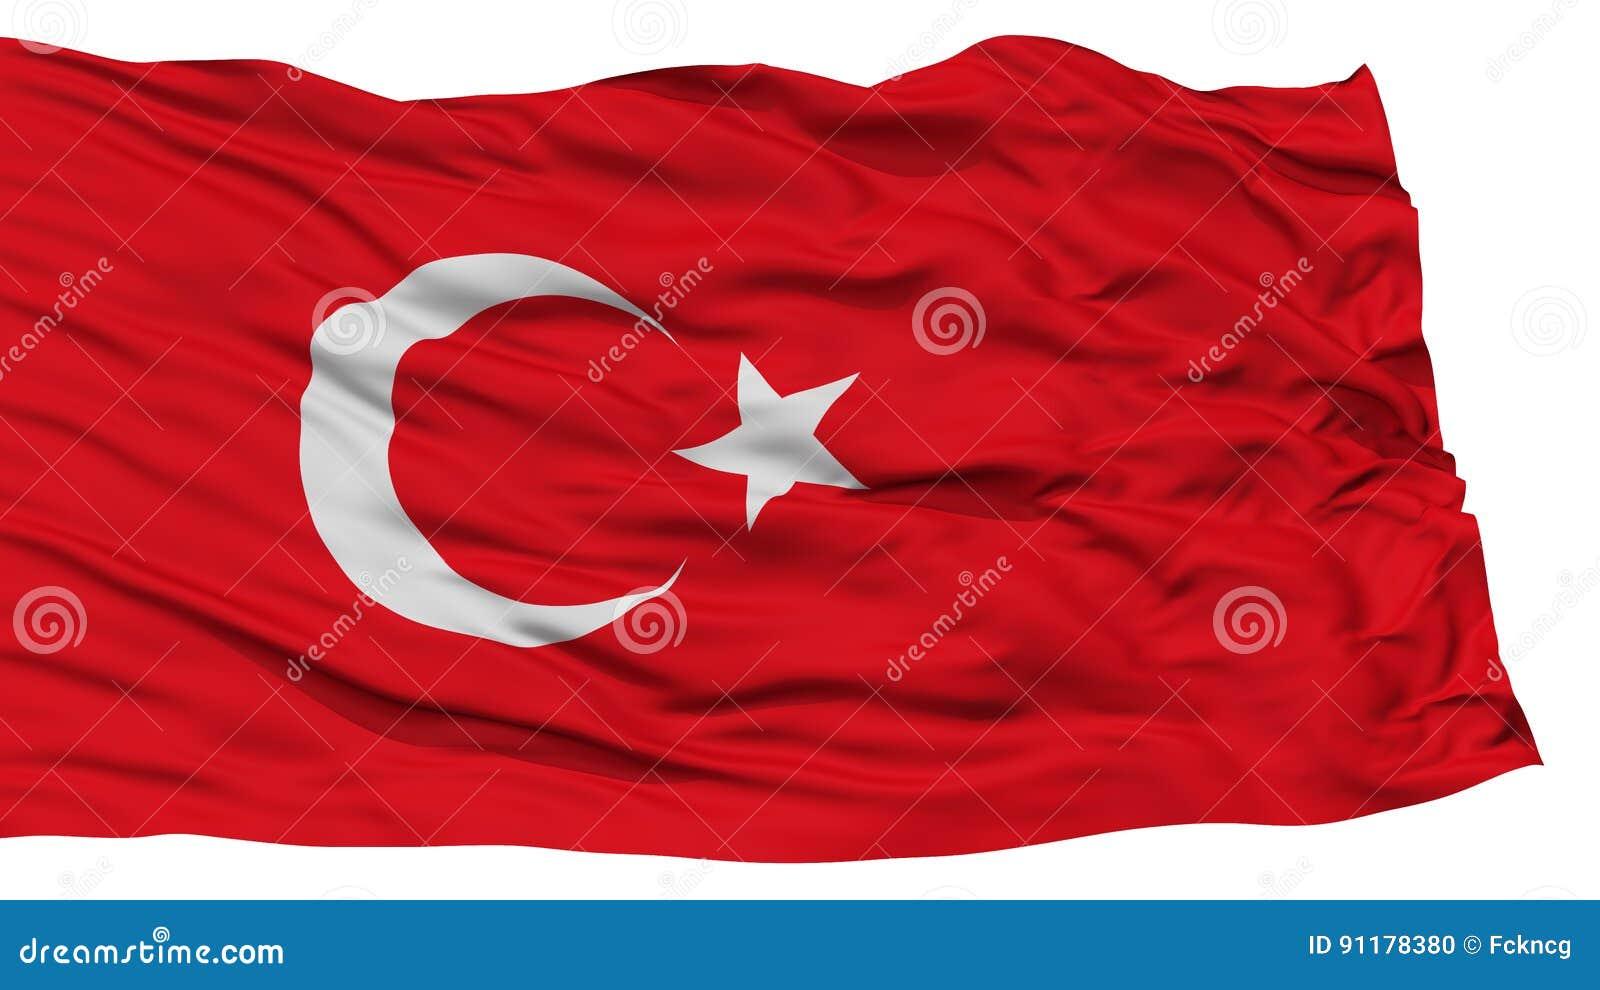 Isolated Turkey Flag